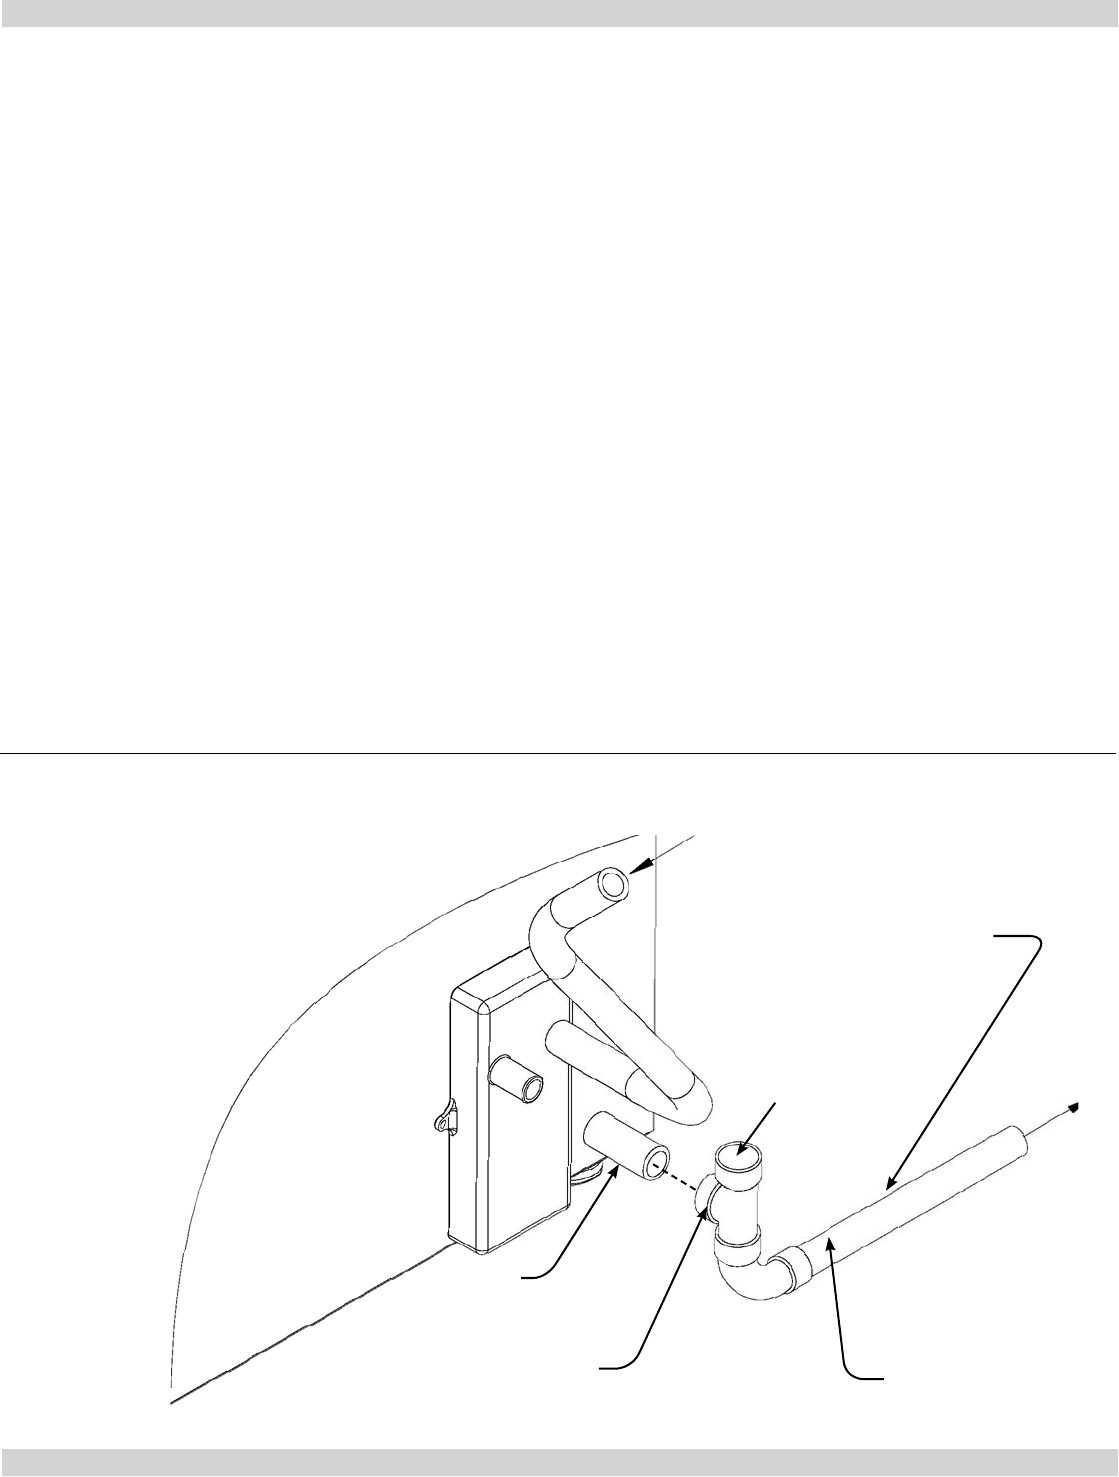 taco 007f wiring diagram database  circulator wiring diagram wiring diagram database taco 007f